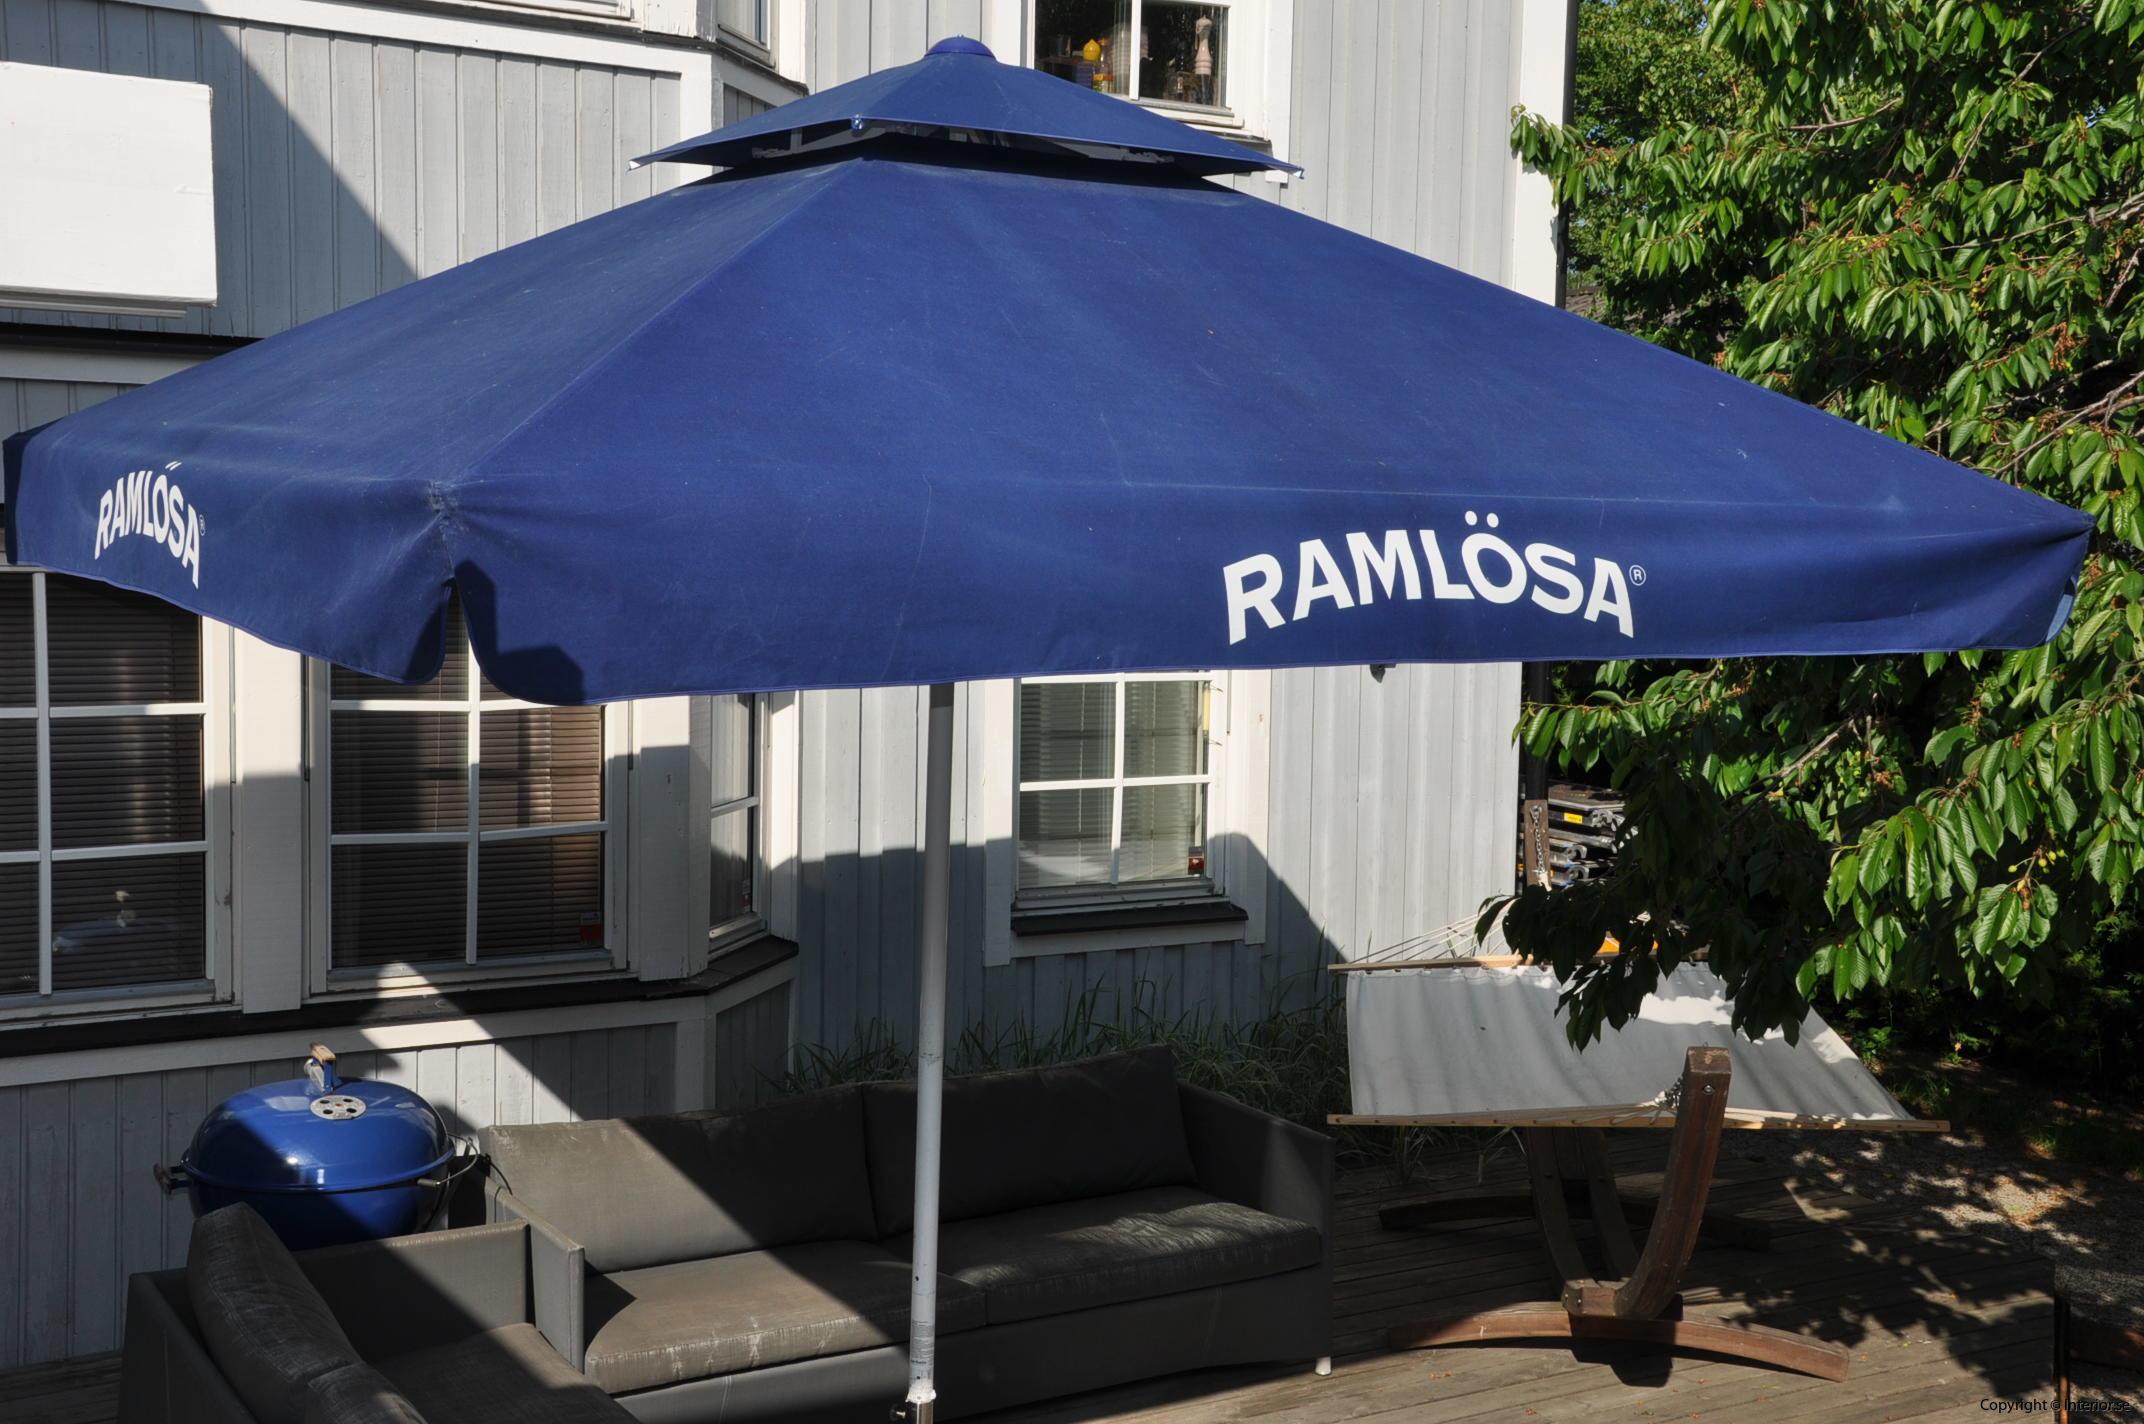 Hyr stora parasoll - 350 x 350 cm stockholm event (2)